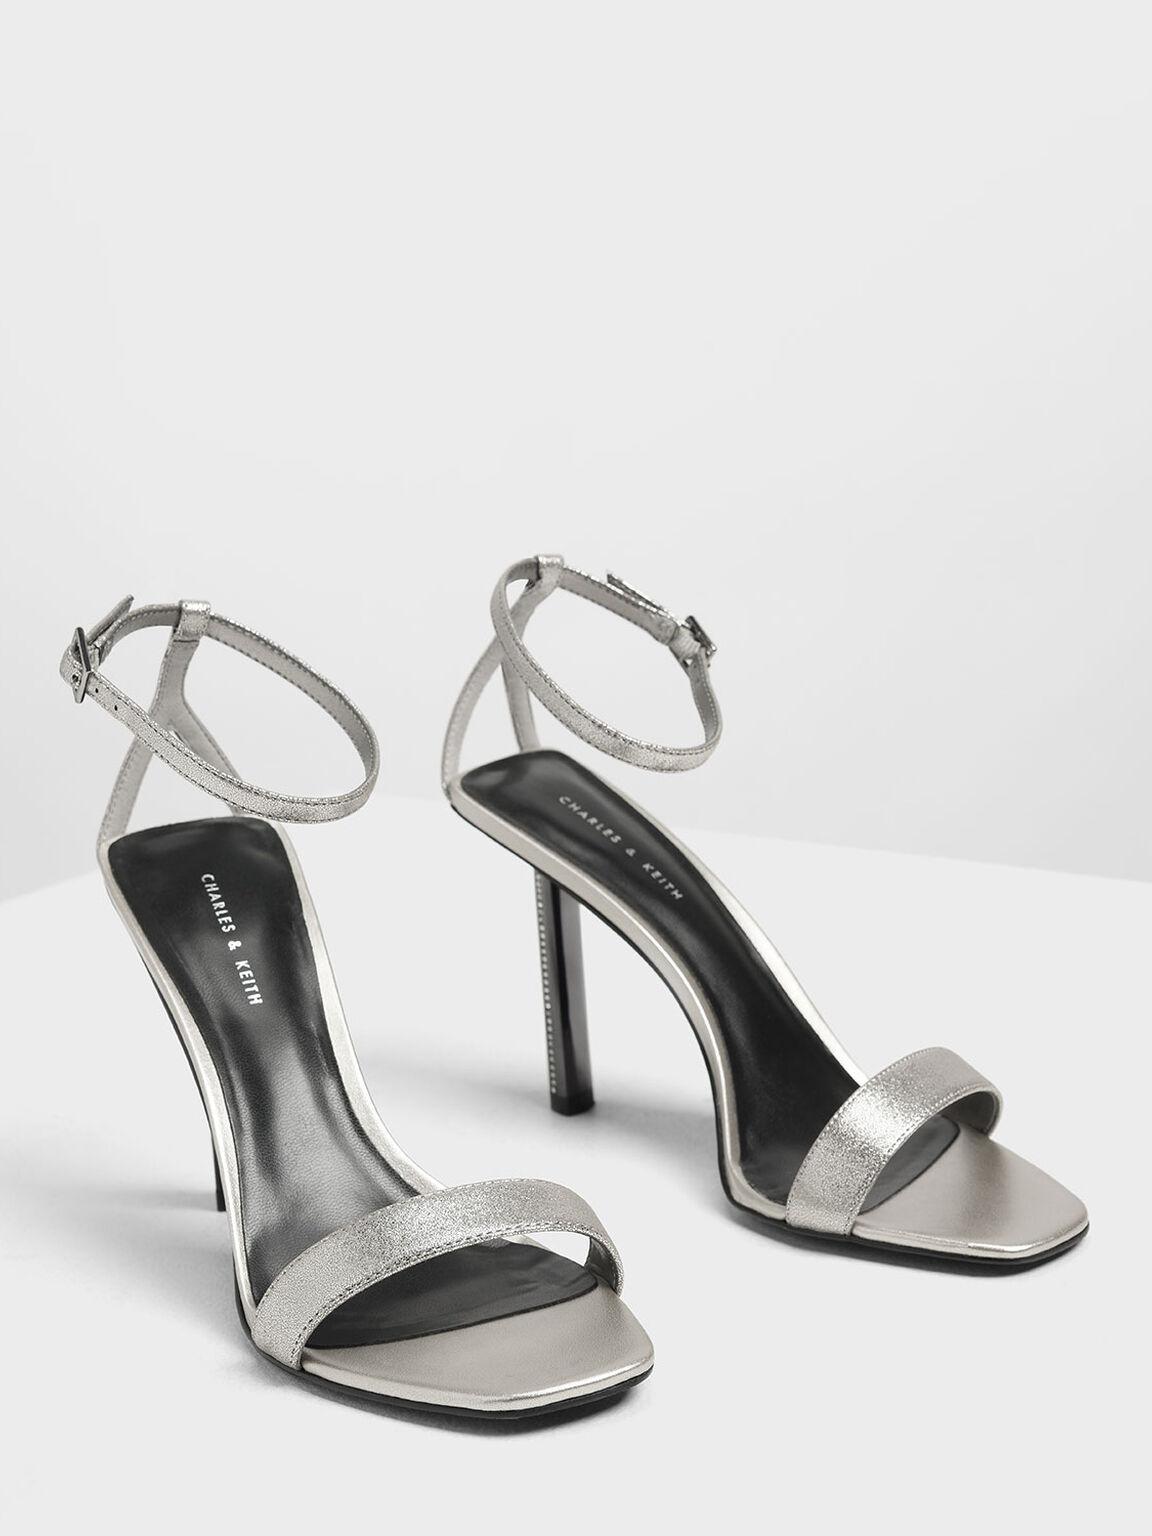 Gem Encrusted Blade Heel Metallic Sandals, Silver, hi-res